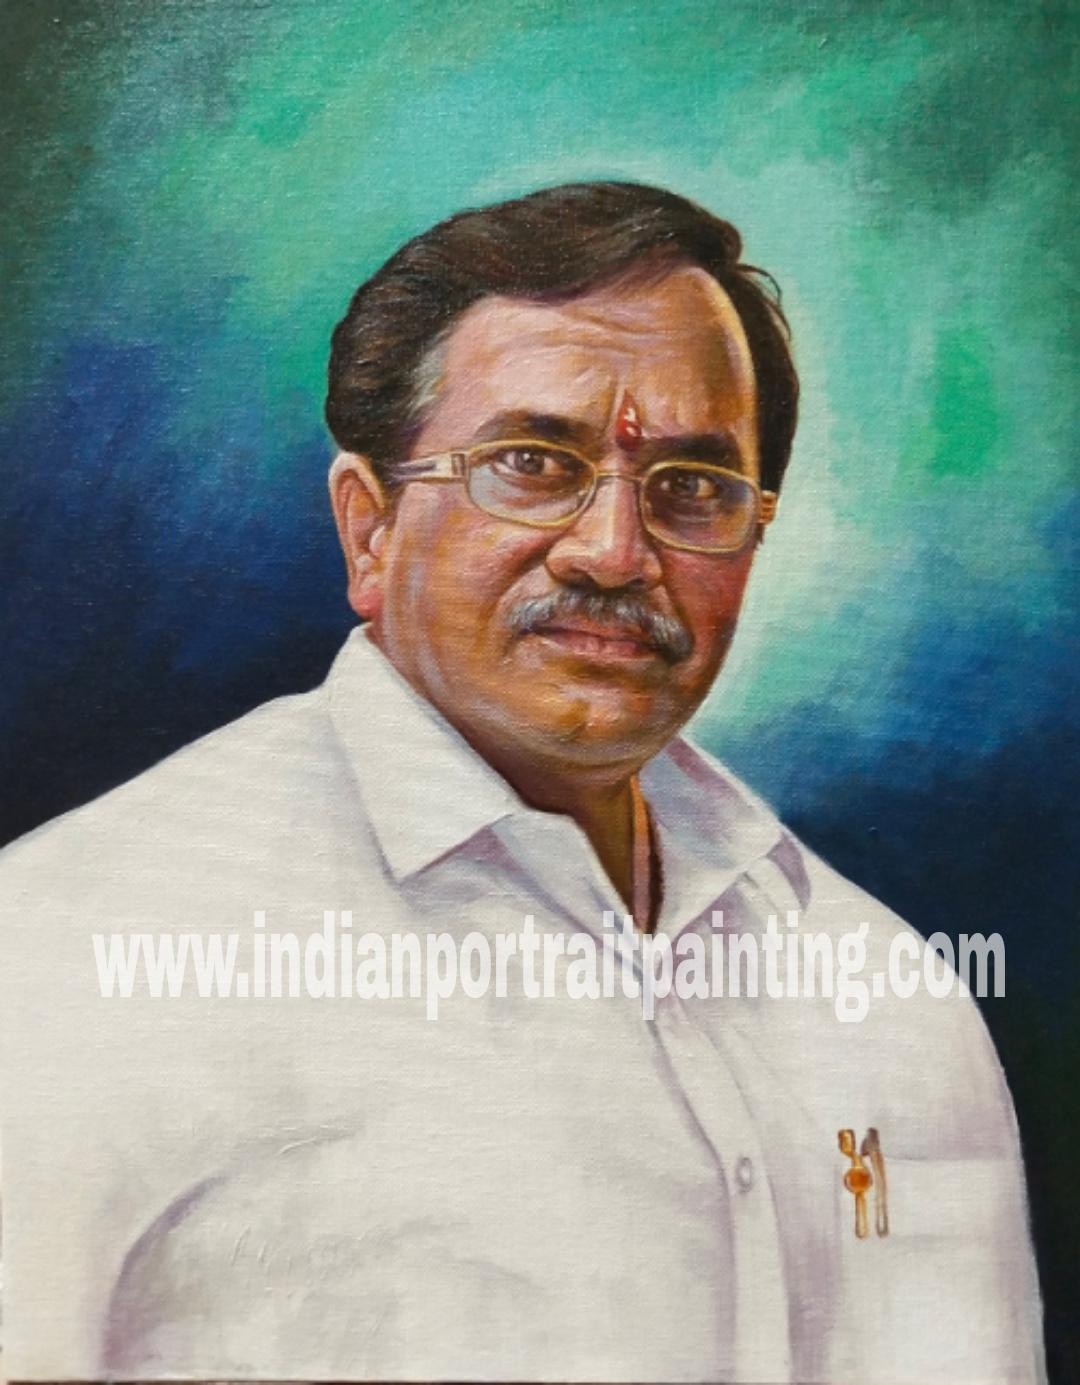 Customizable portrait painting creator